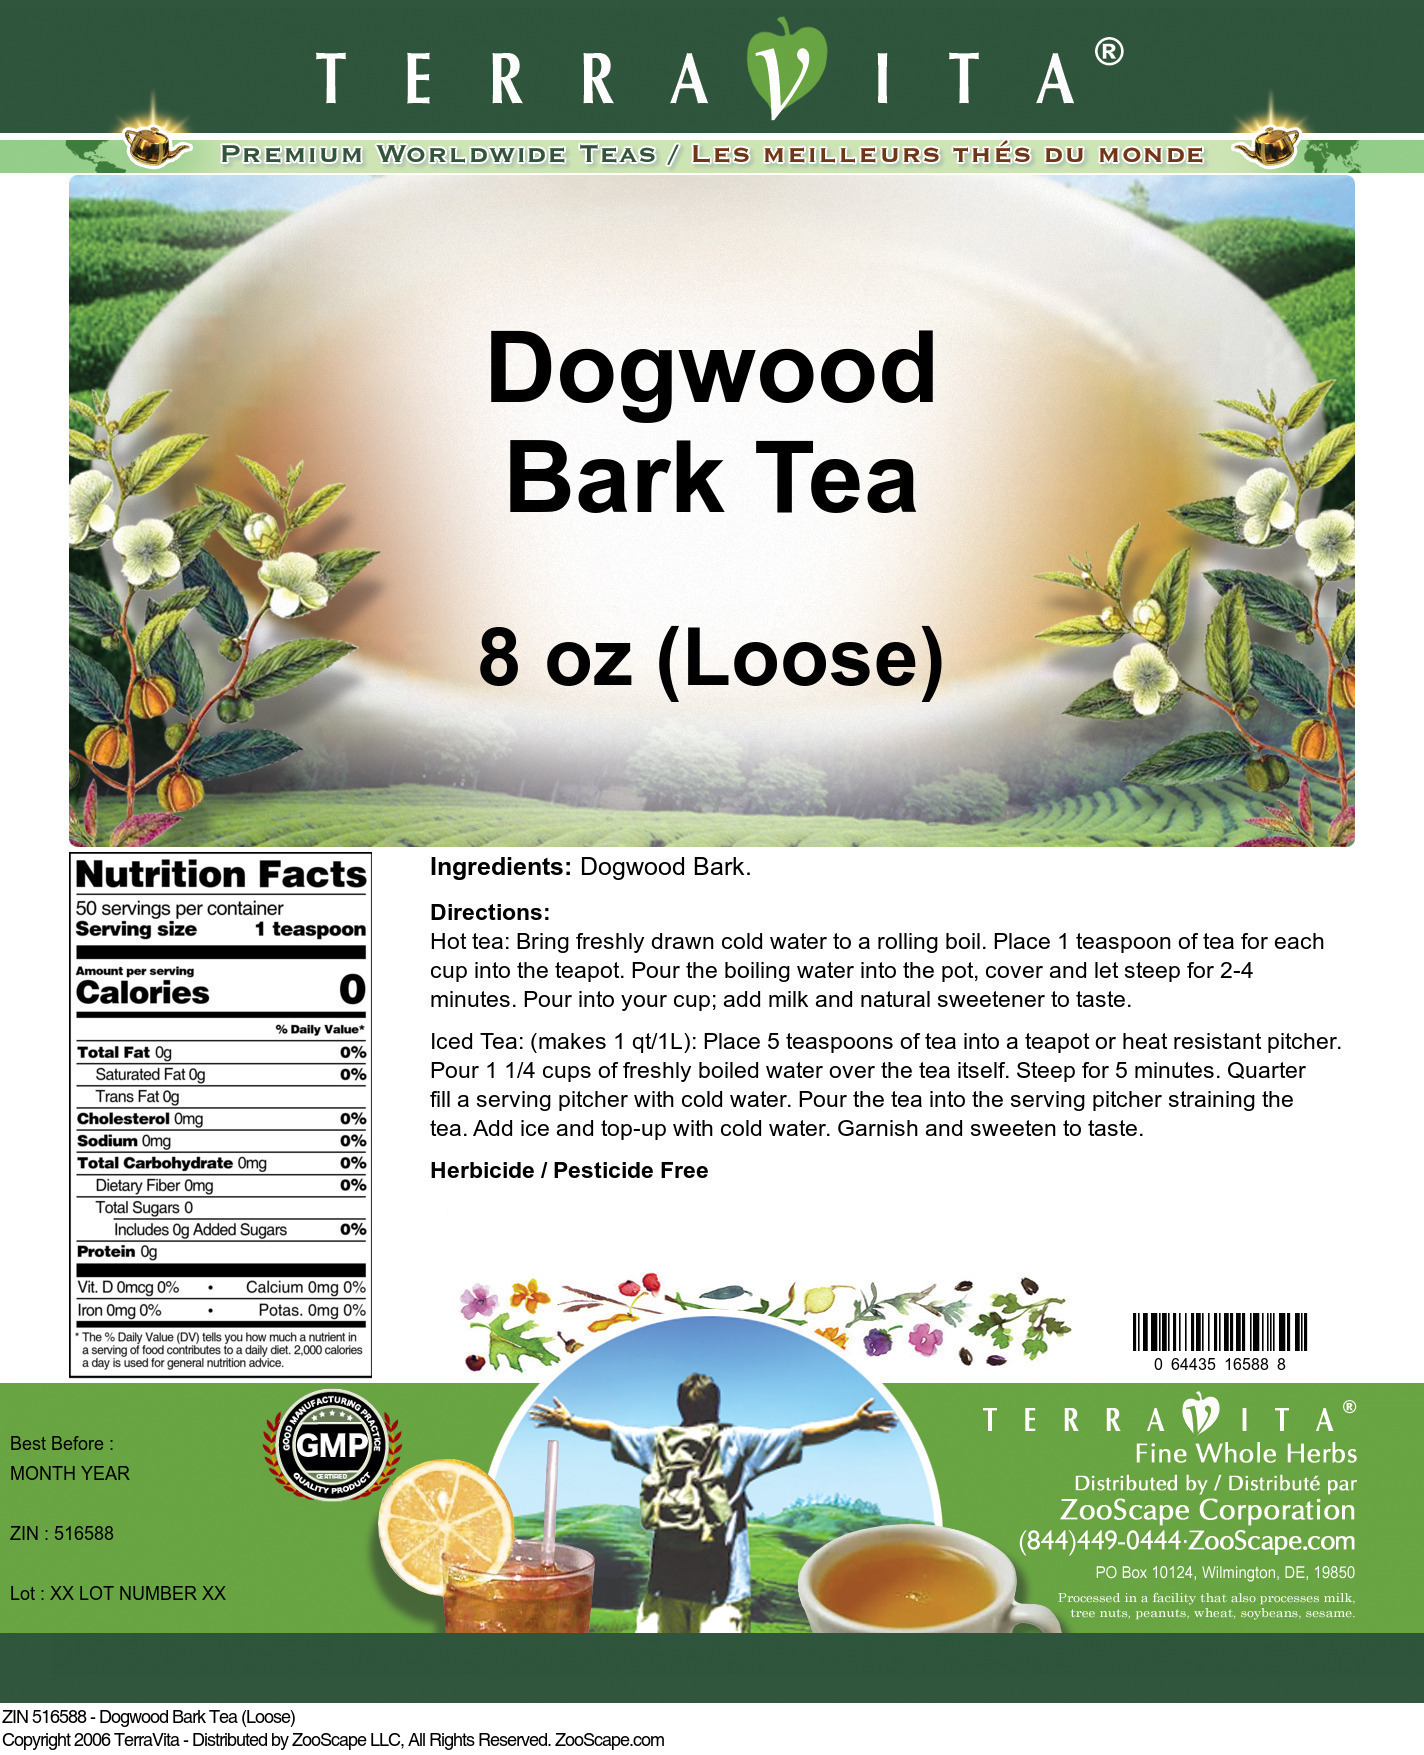 Dogwood Bark Tea (Loose)